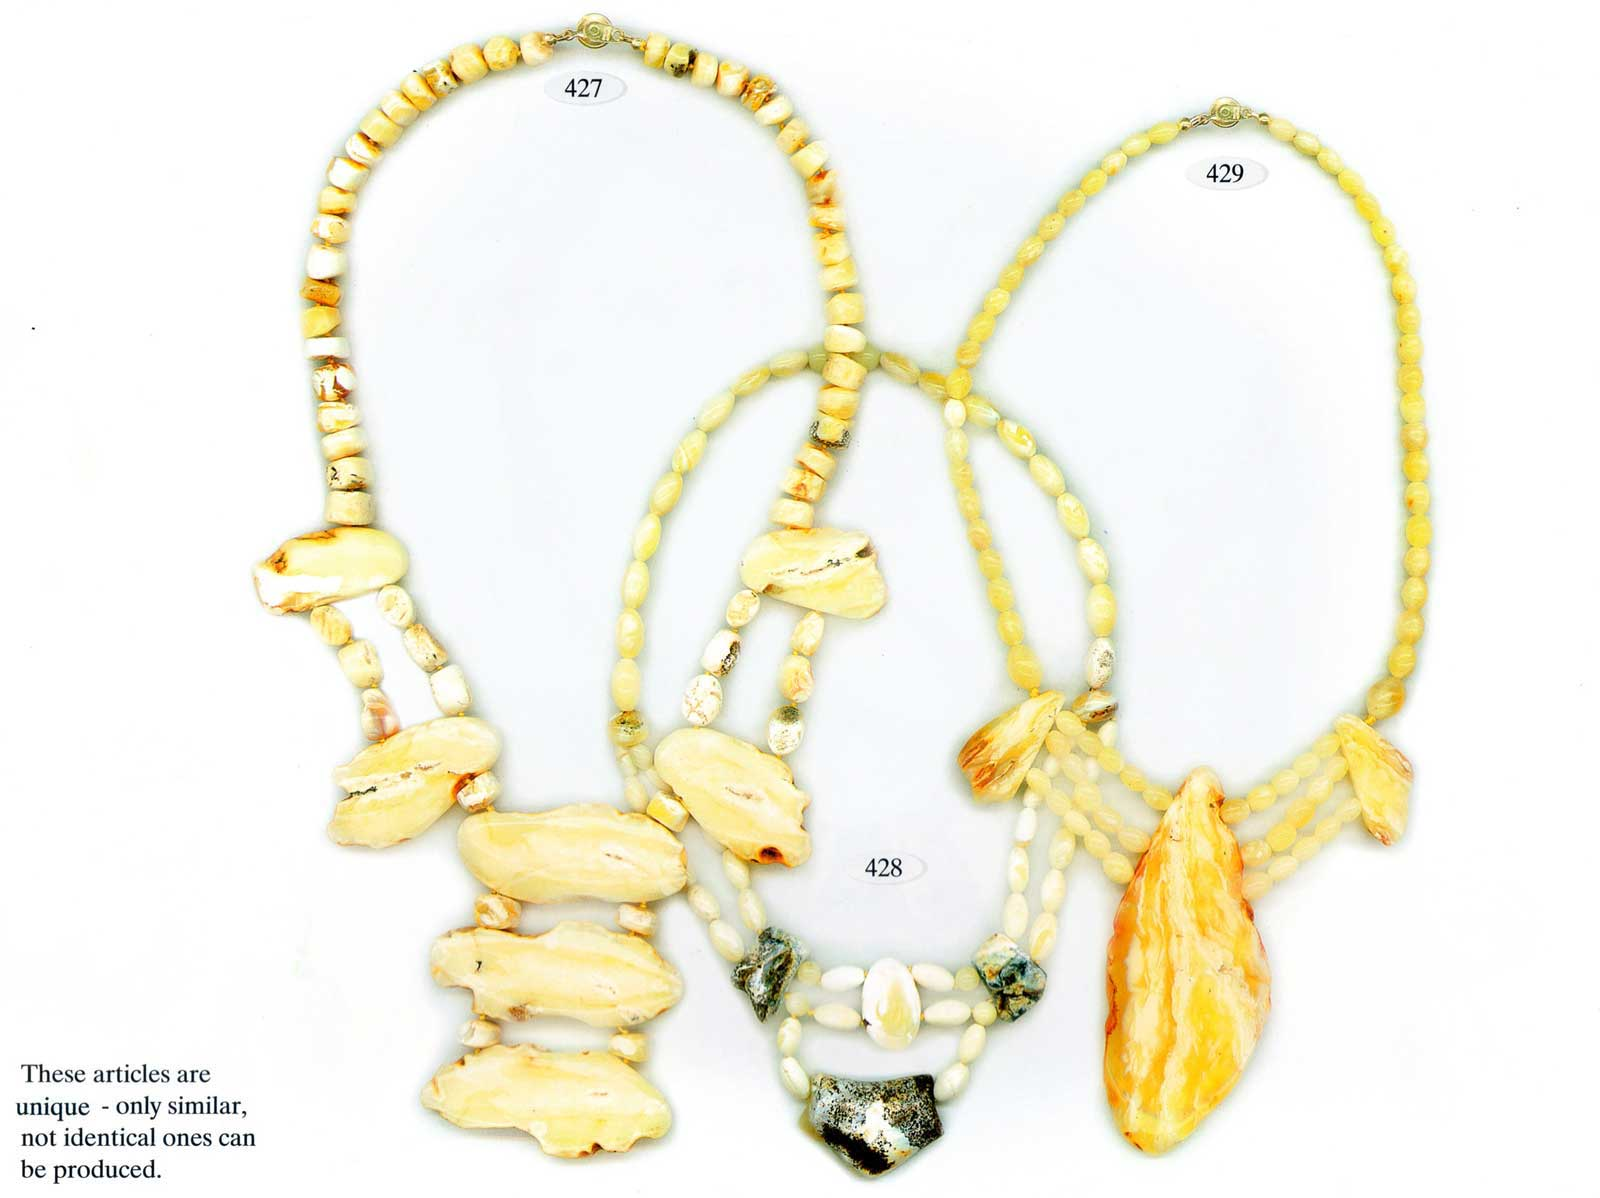 Raw Amber Jewelry